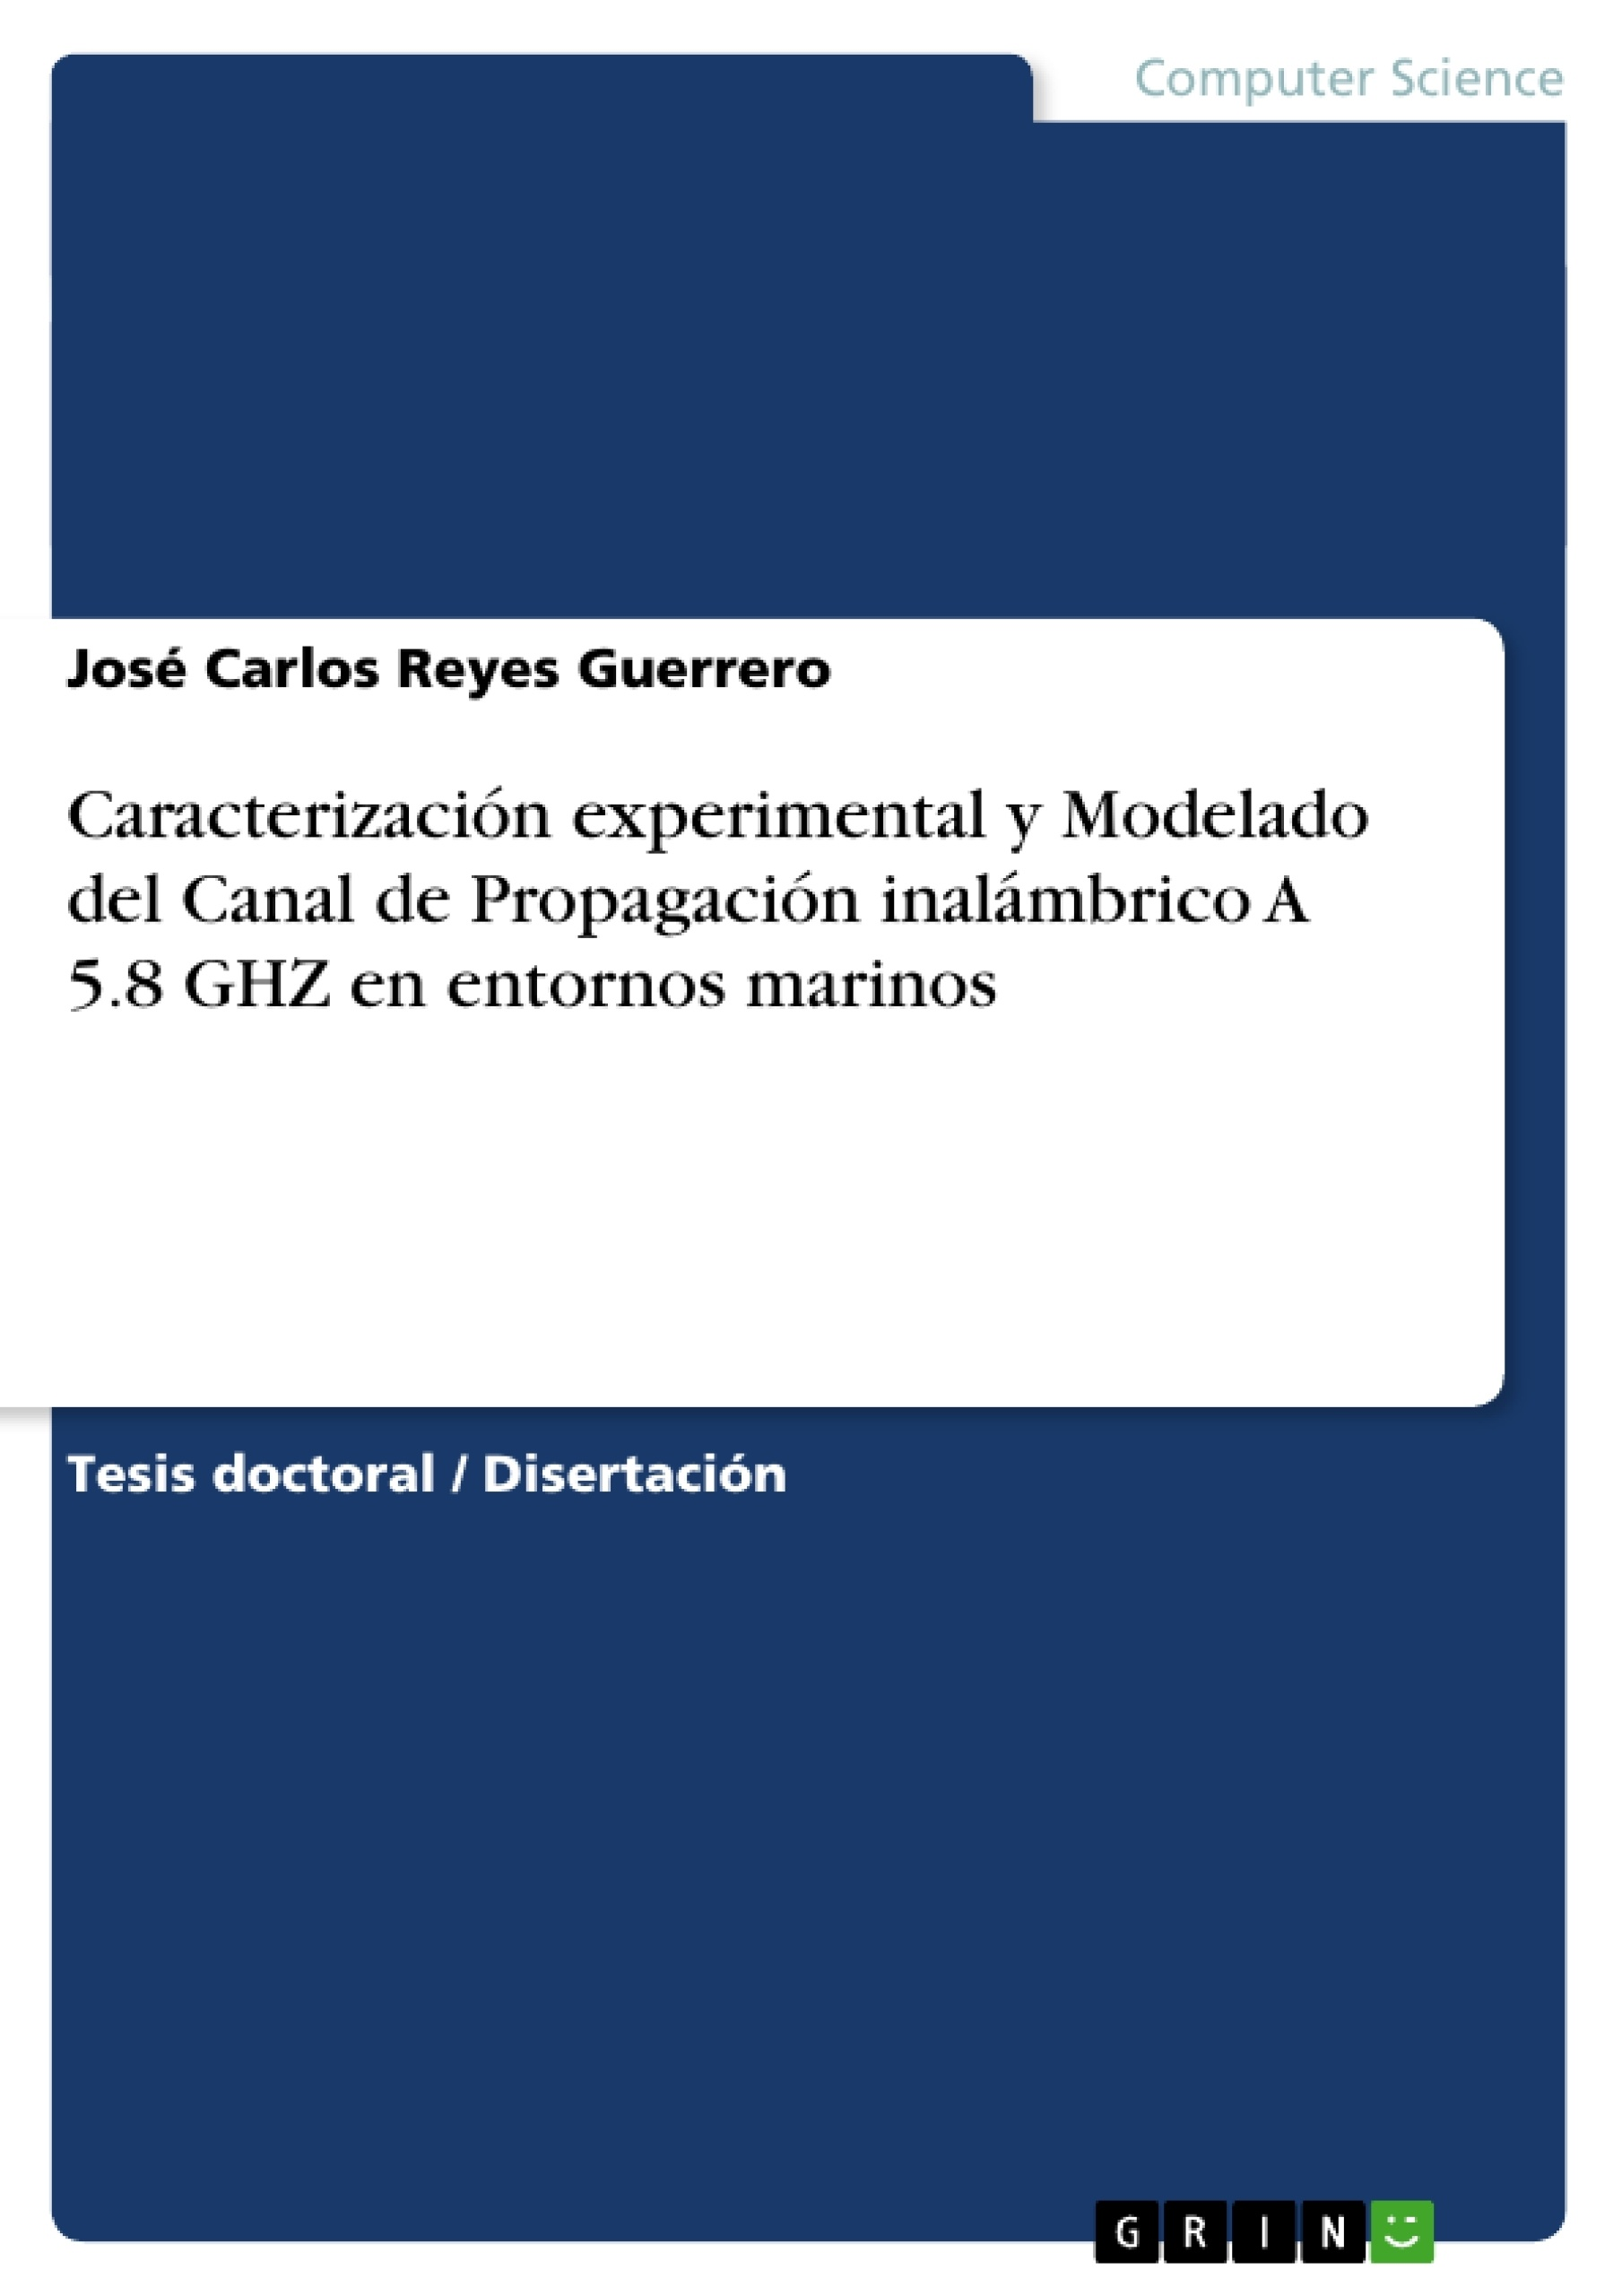 Título: Caracterización experimental y Modelado del Canal de Propagación inalámbrico A 5.8 GHZ en entornos marinos